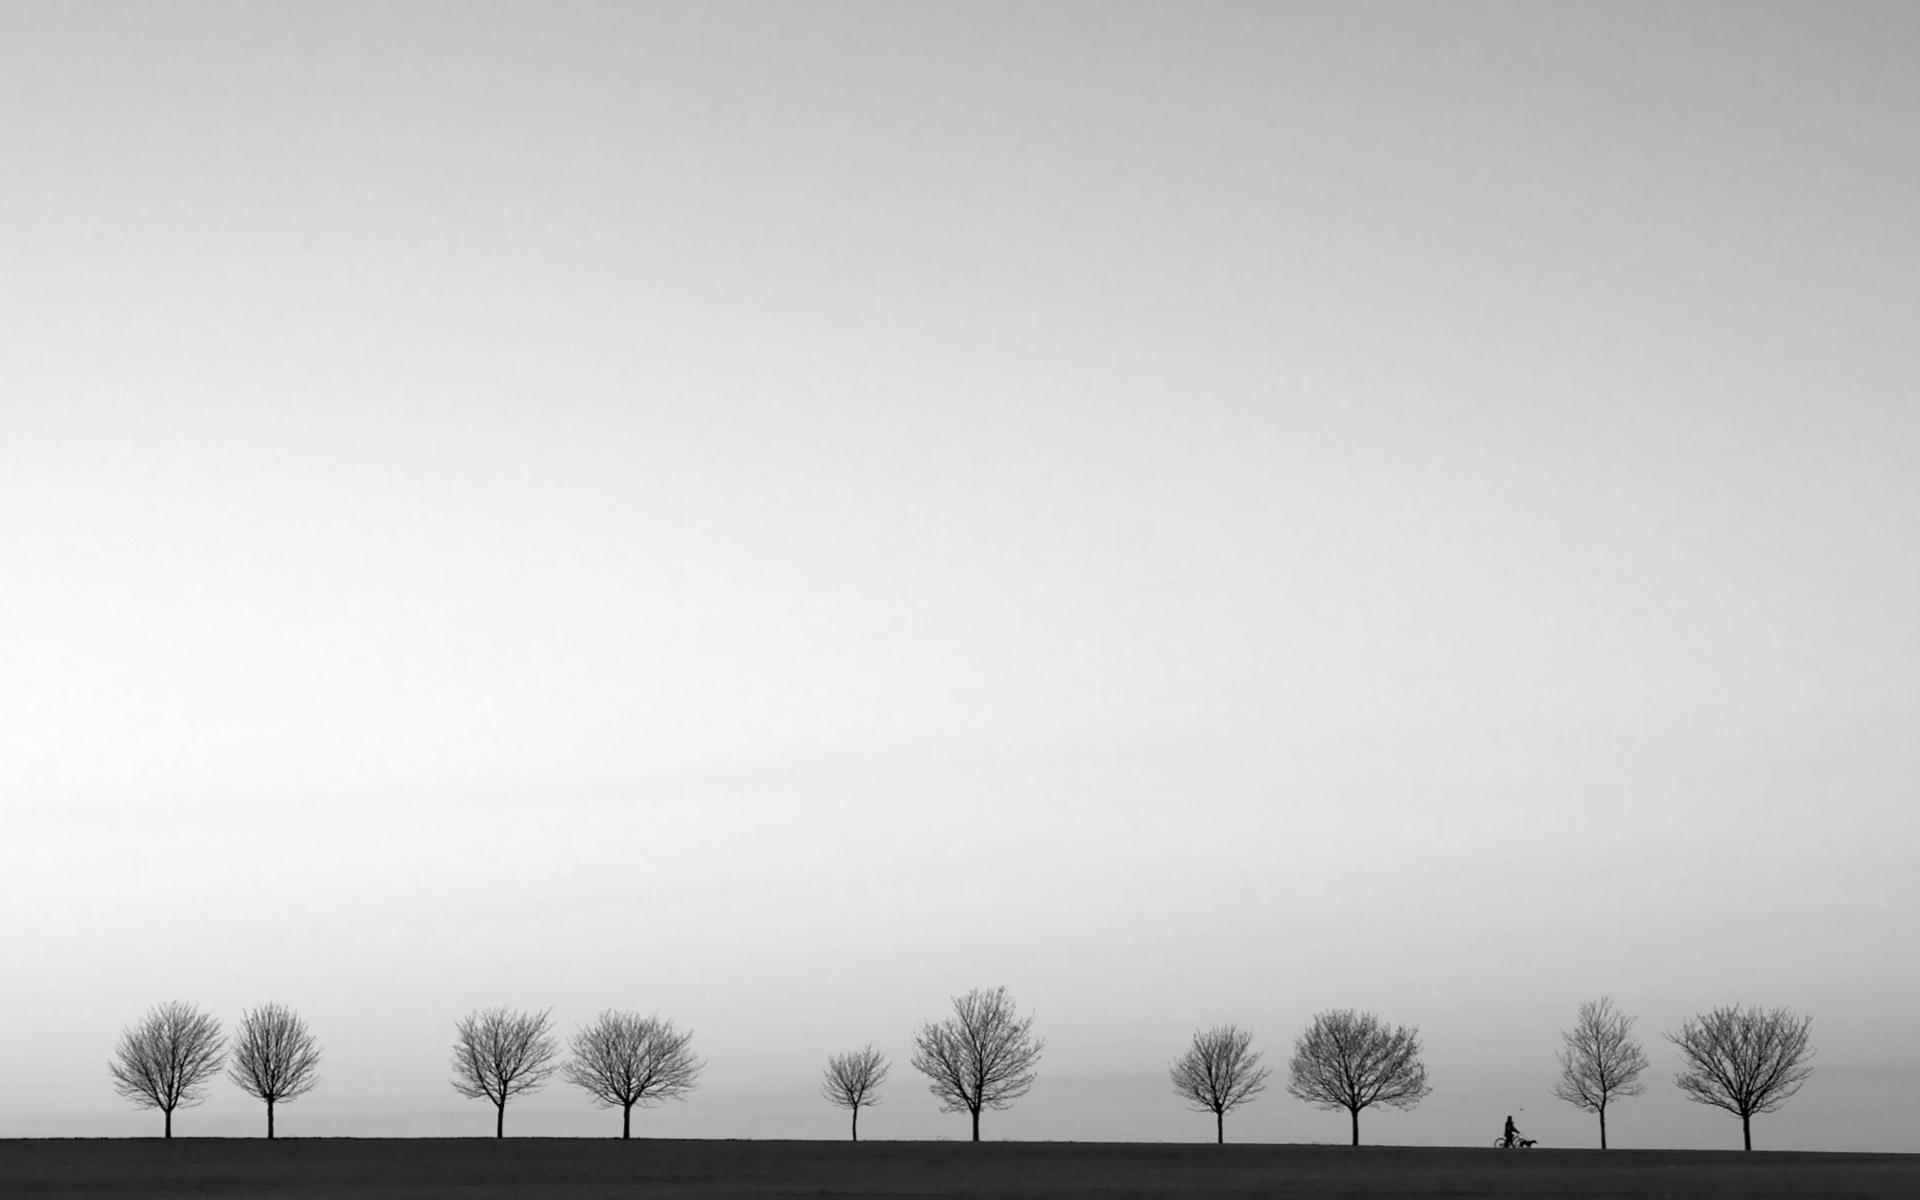 Landscape Trees Black And White Jpg 1920 C3 A3 C2 971200 Minimal ...